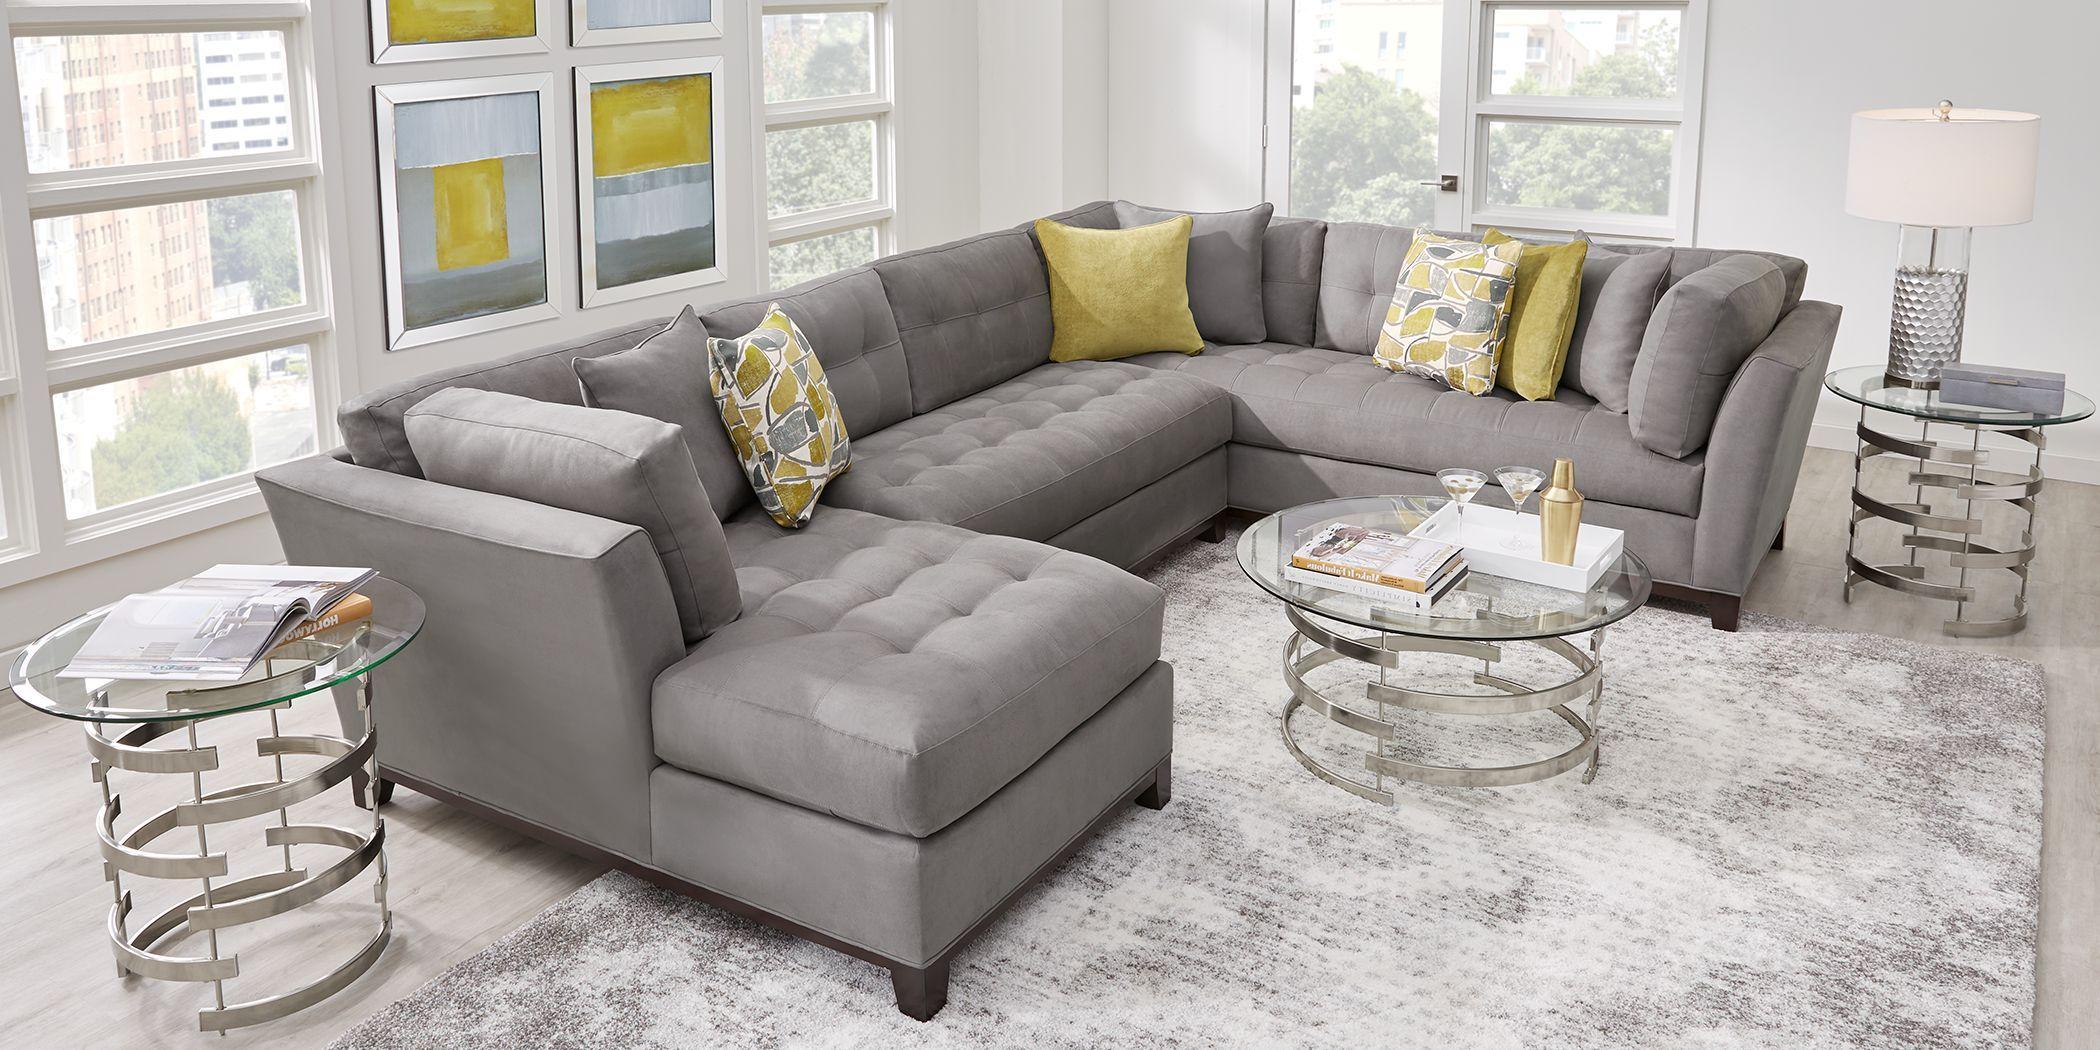 Nice Cindy Crawford Sectional Sofa Good Cindy Crawford Sectional